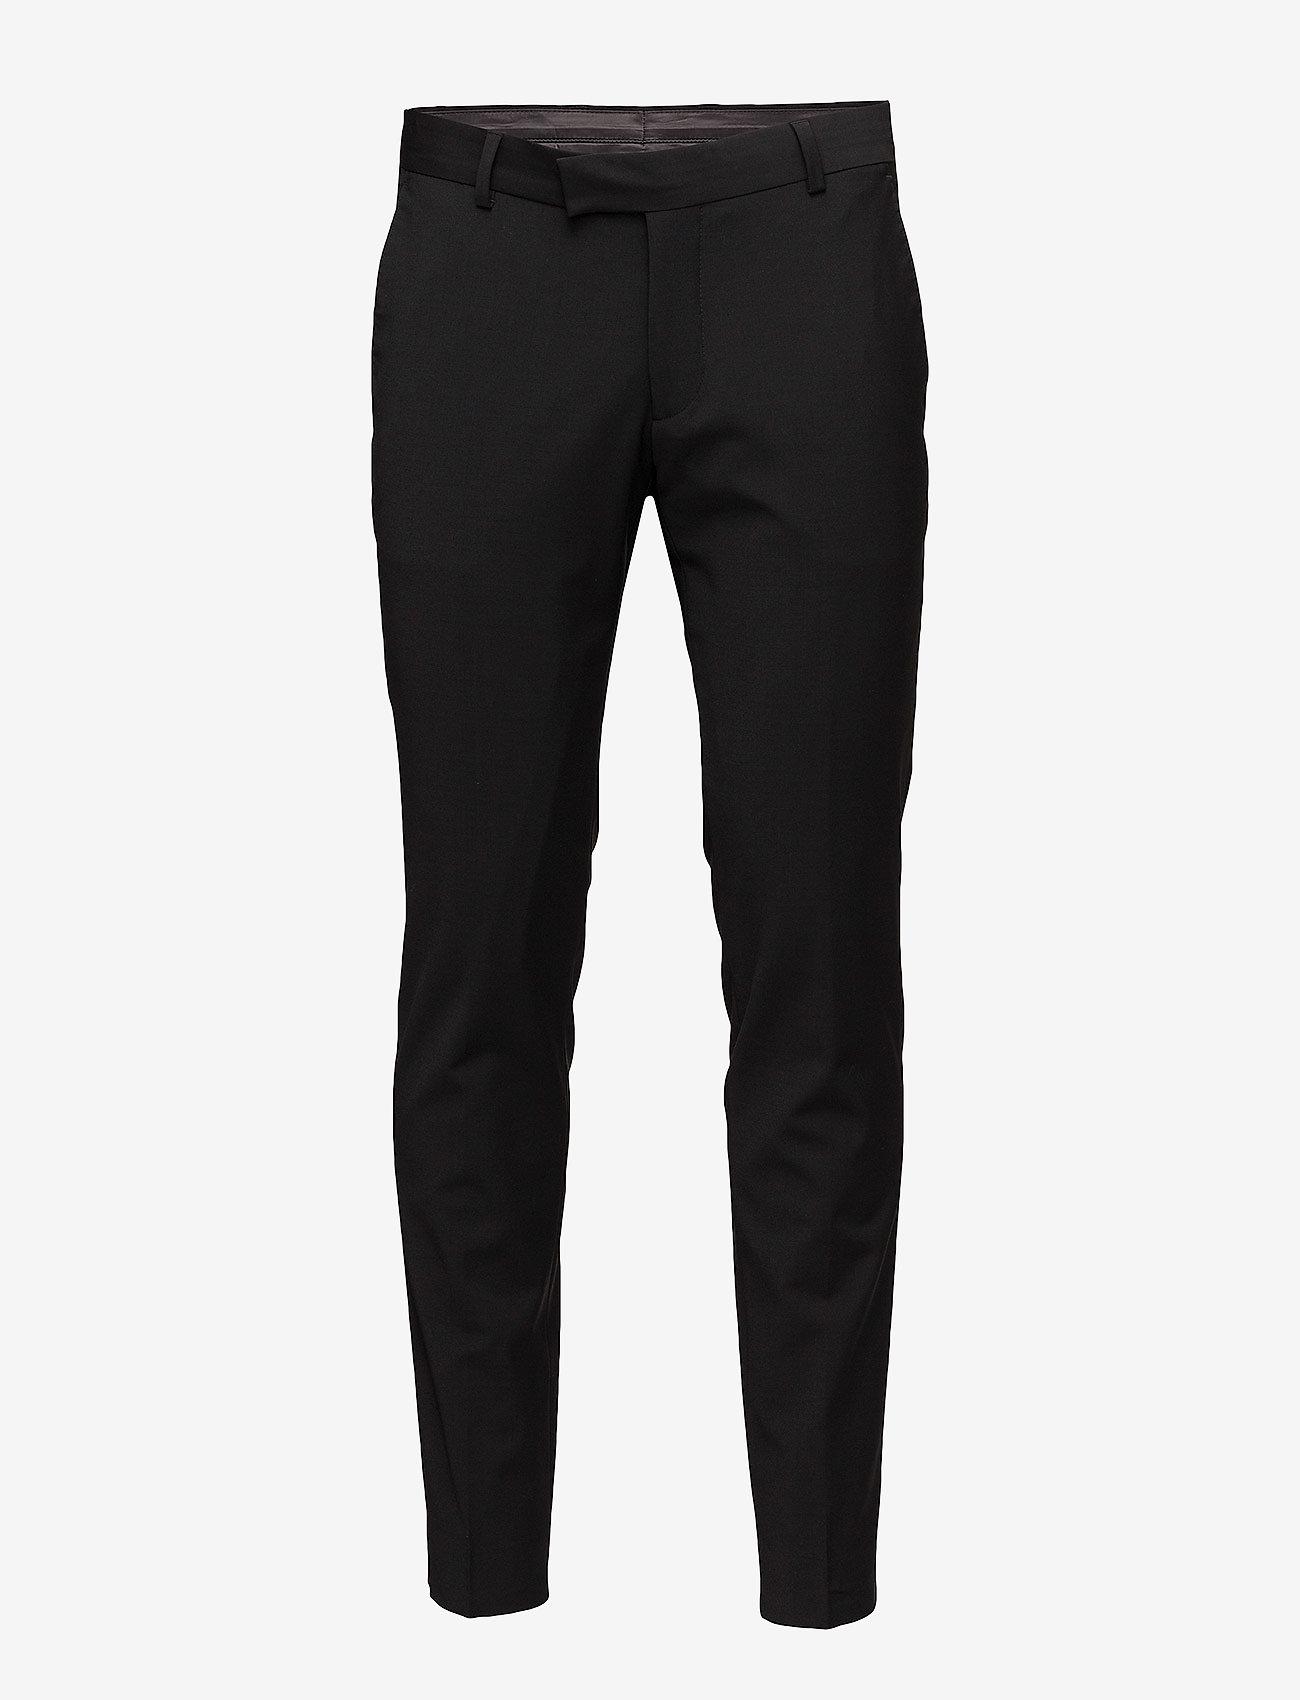 Esprit Collection - Pants suit - formele broeken - black - 0